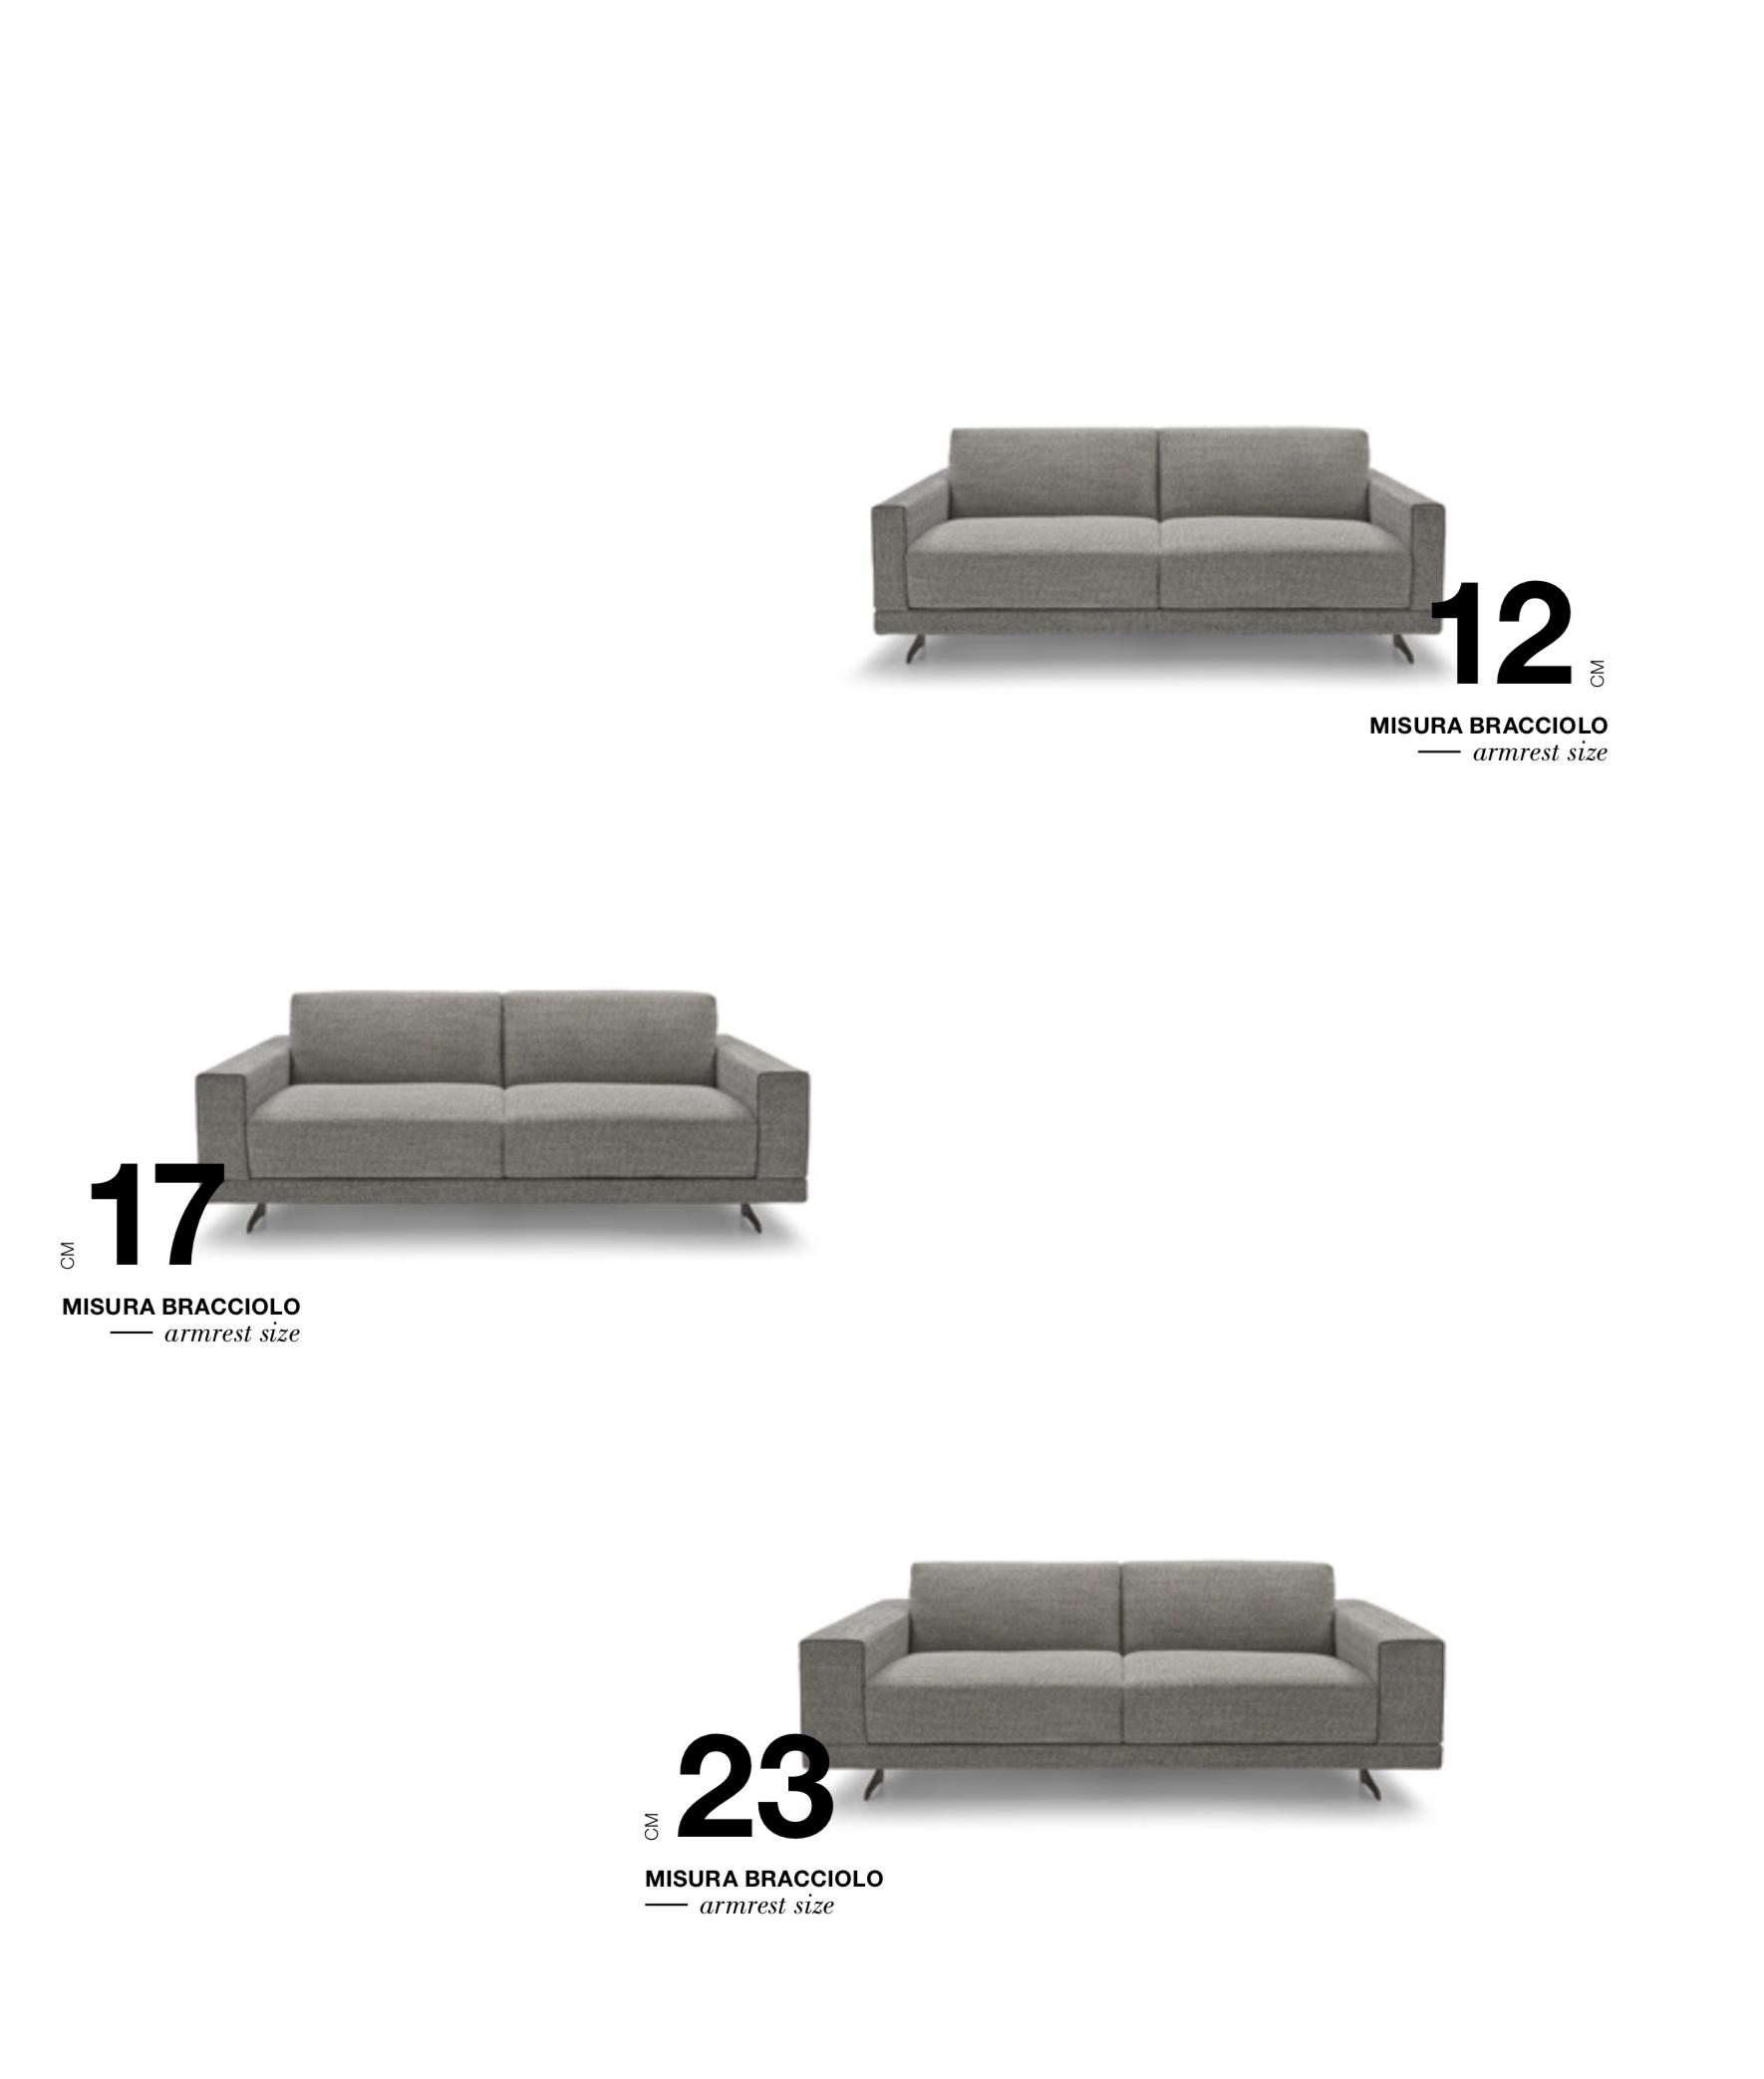 Modern Designer Sofa Beds Italian Furniture - momentoitalia00002.png